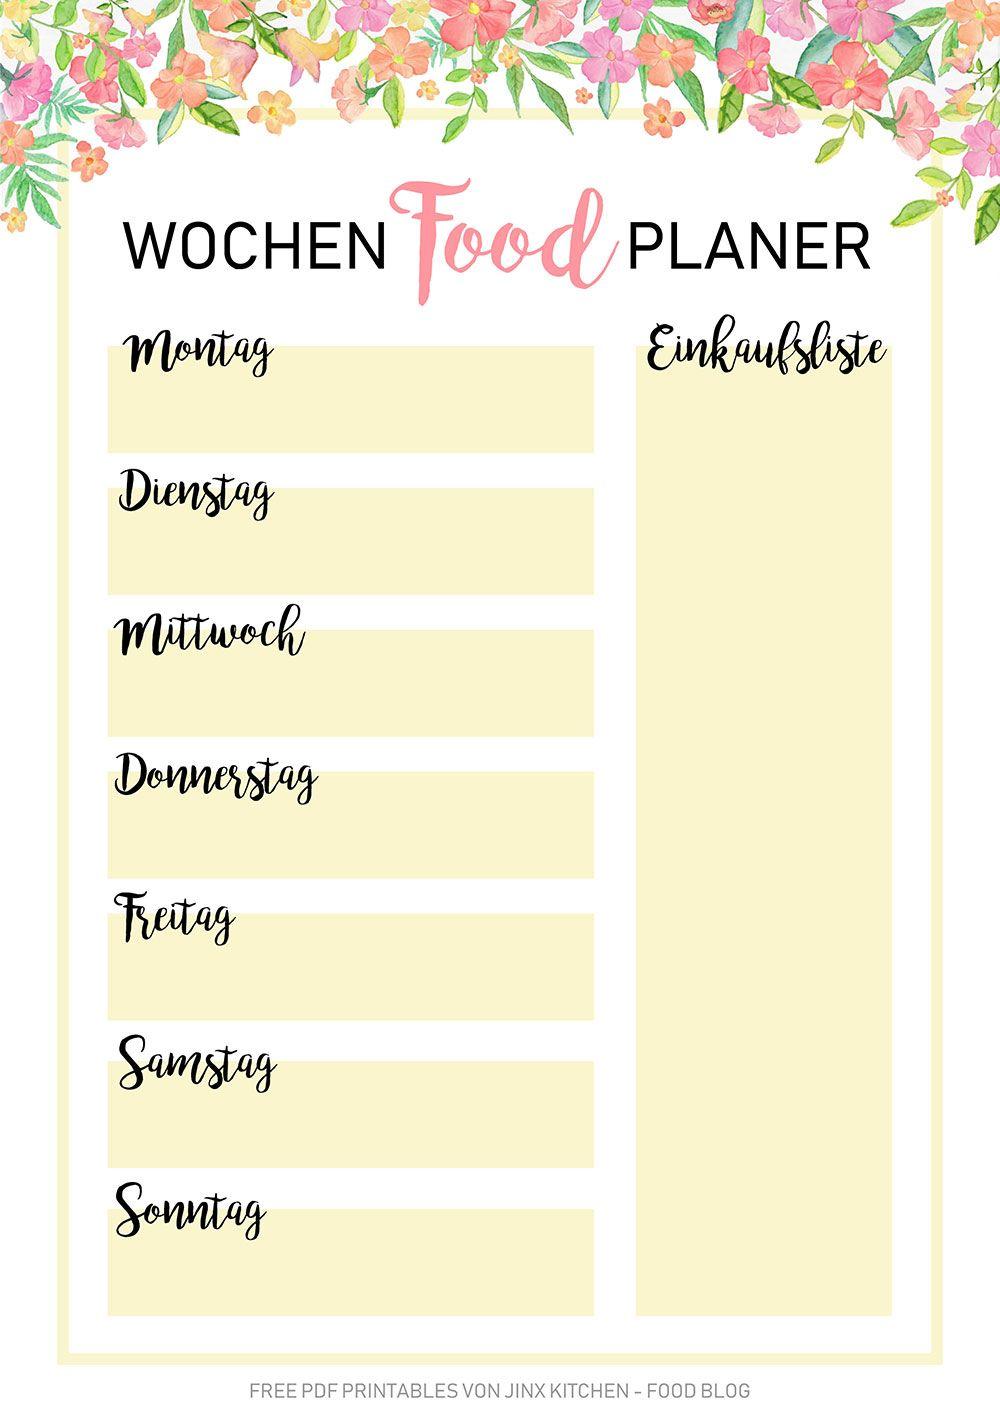 30 Tage Mahlzeit Plan zum Abnehmen pdf